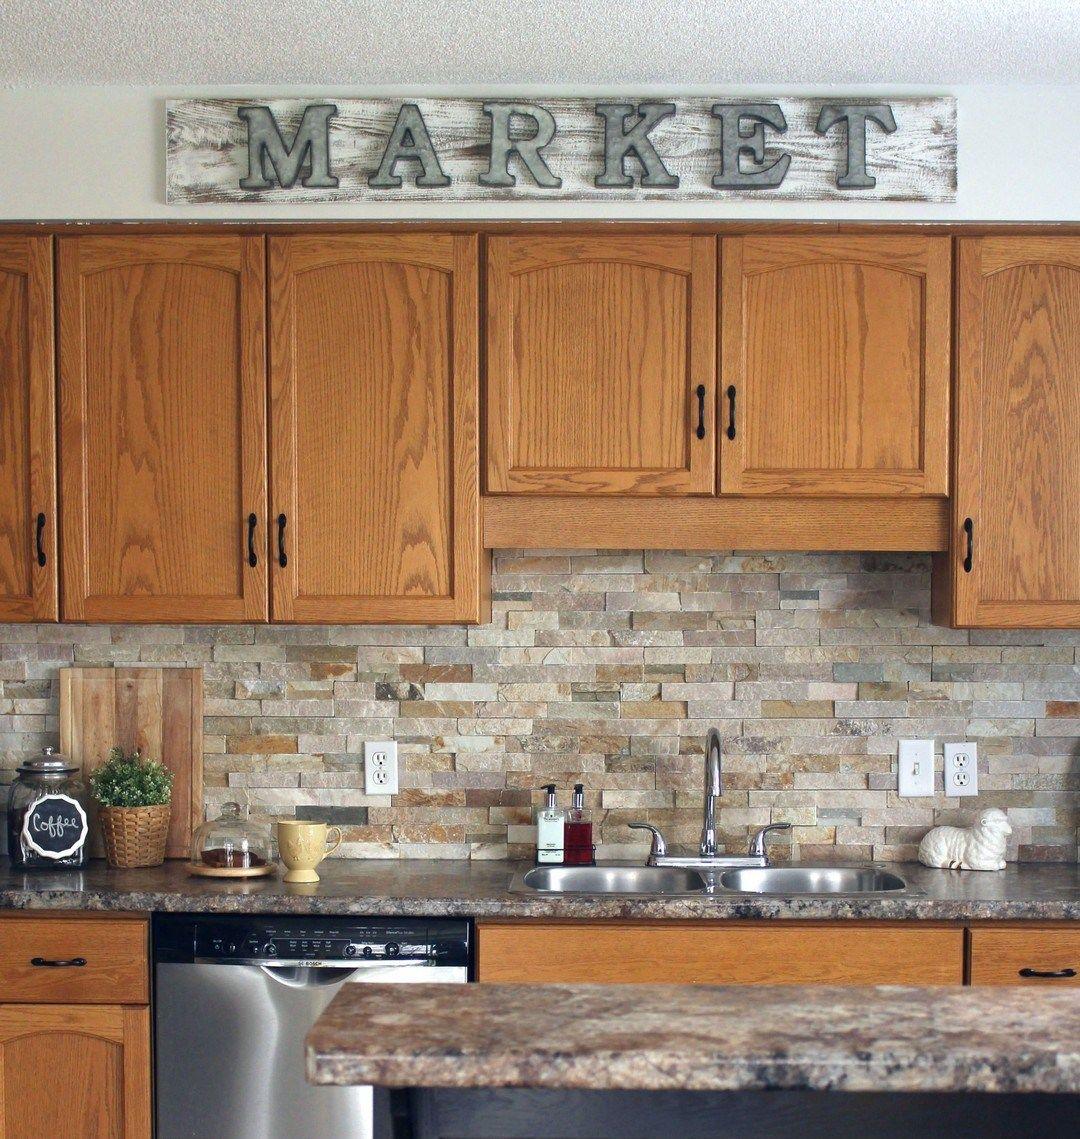 29 Fantastic Kitchen Backsplash Ideas With Oak Cabinets 4